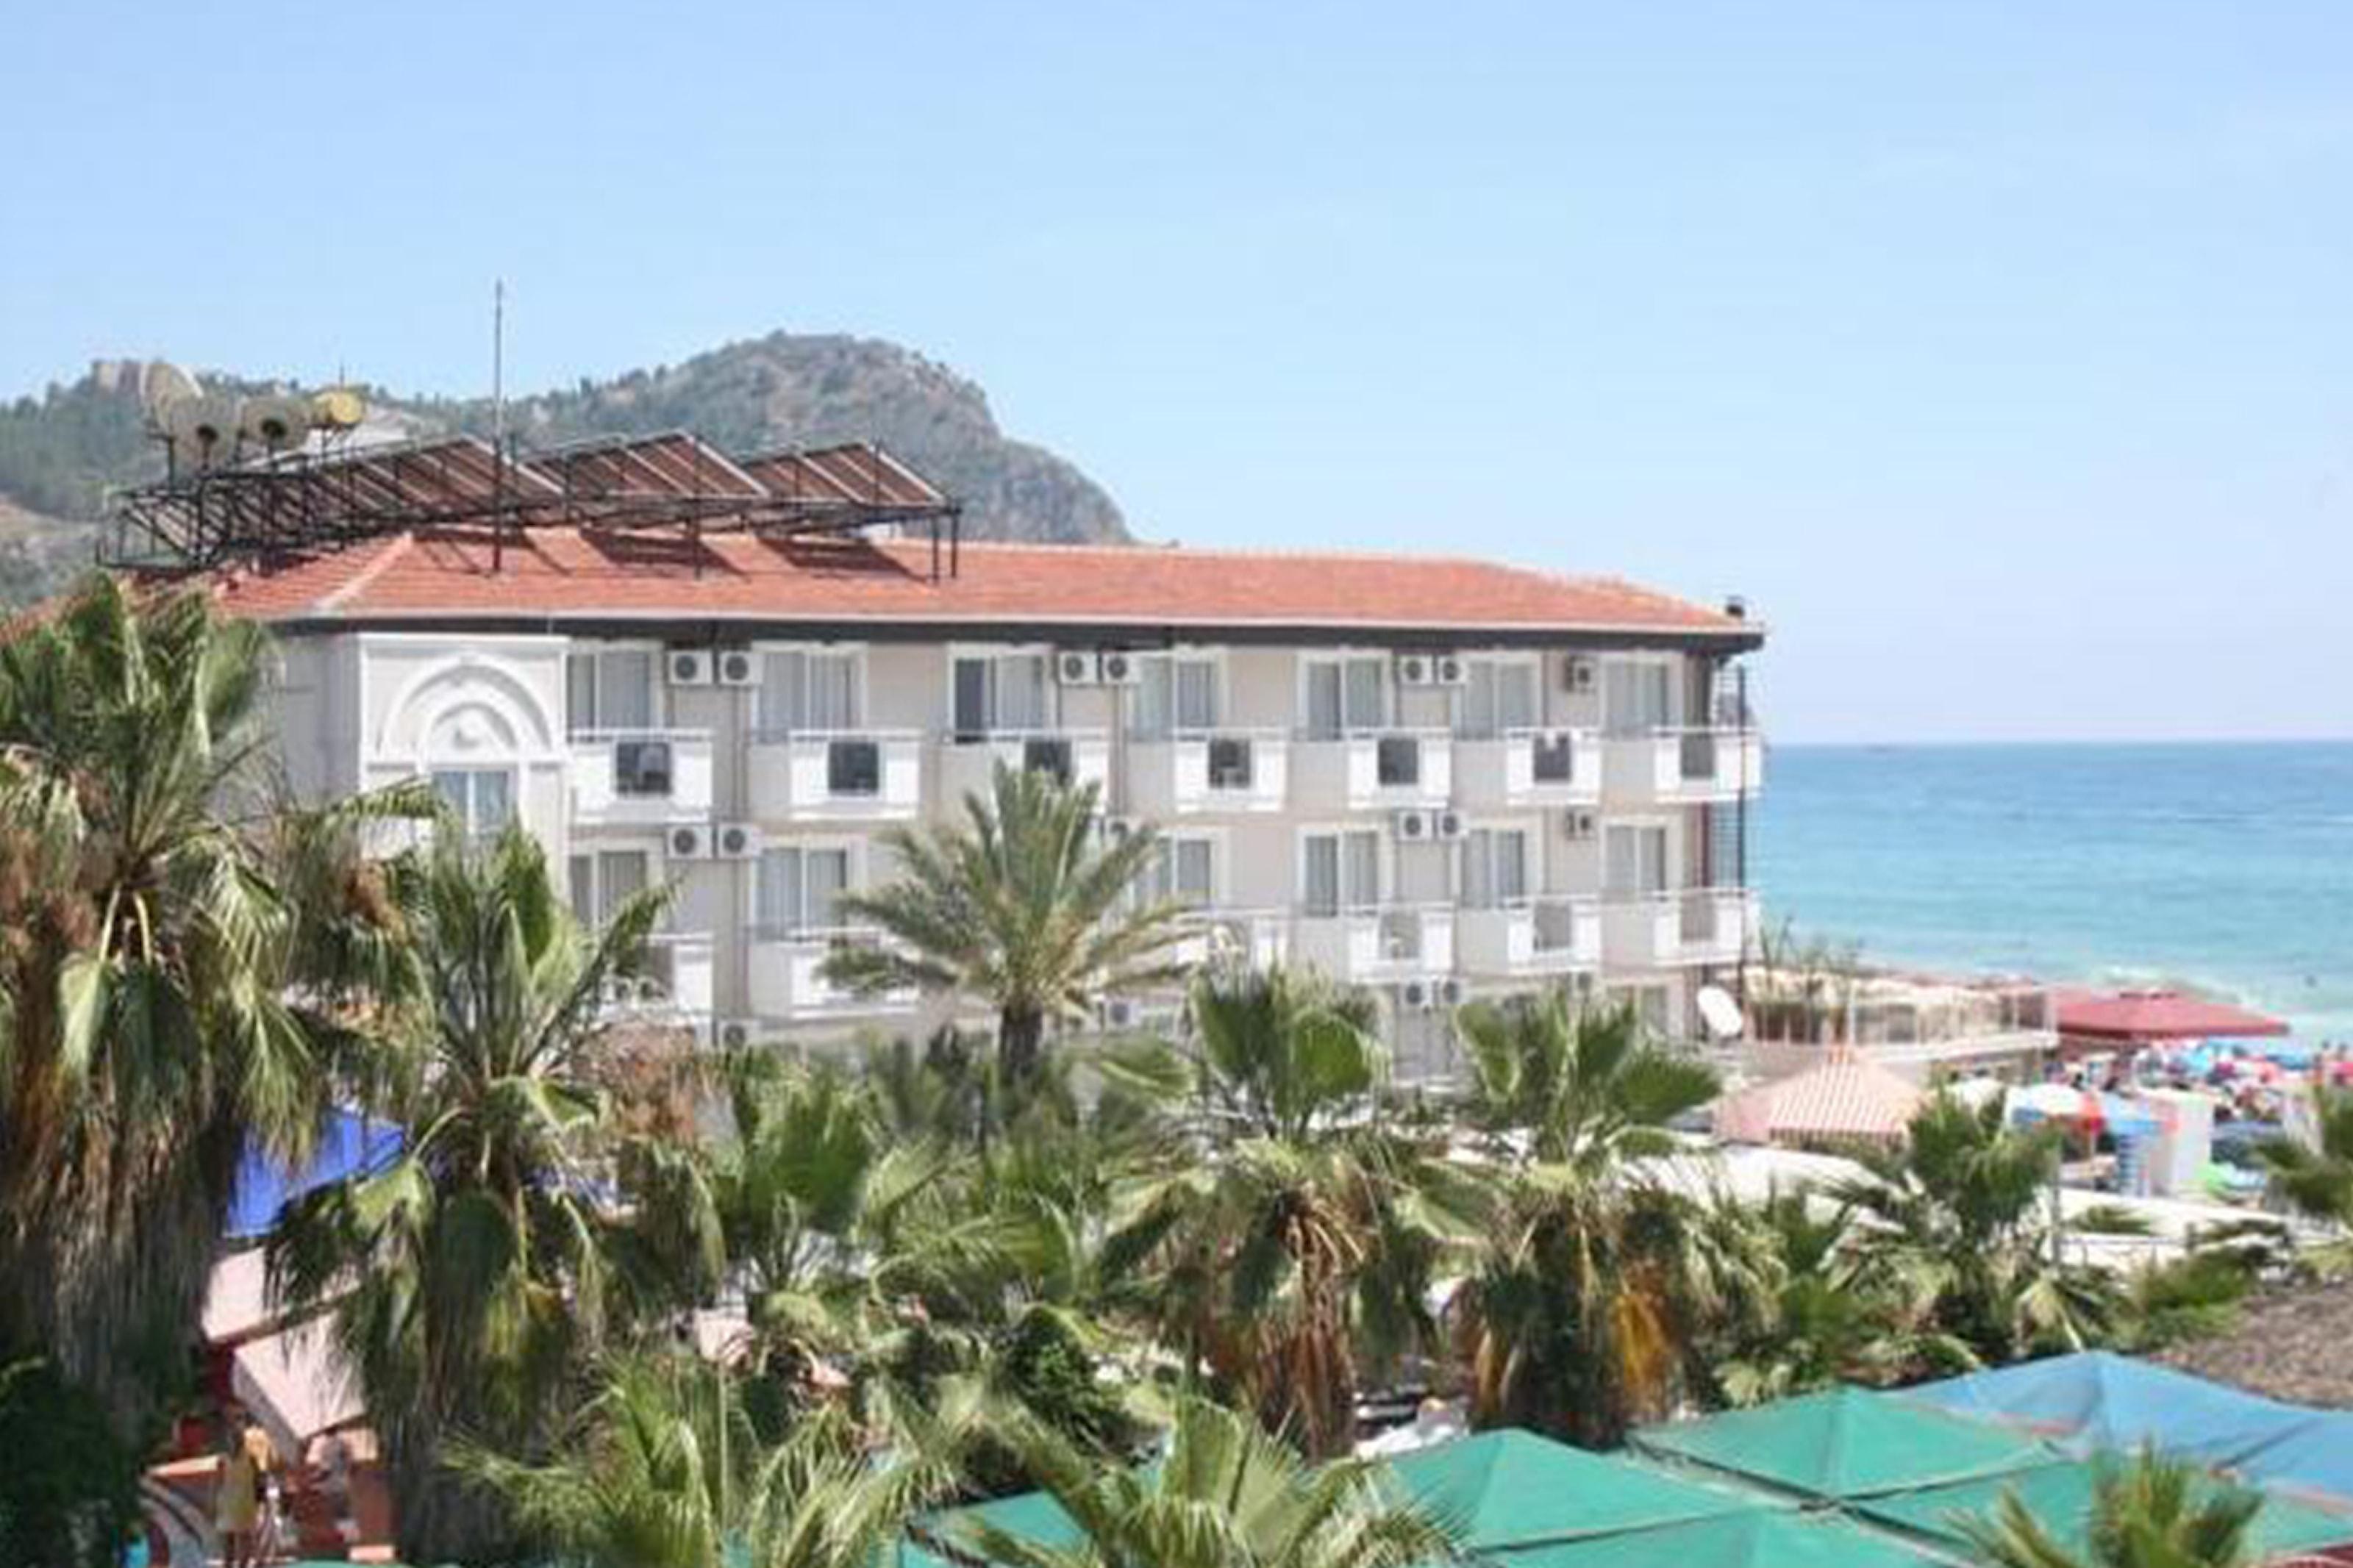 Palmiye Beach Hotel i Alanya